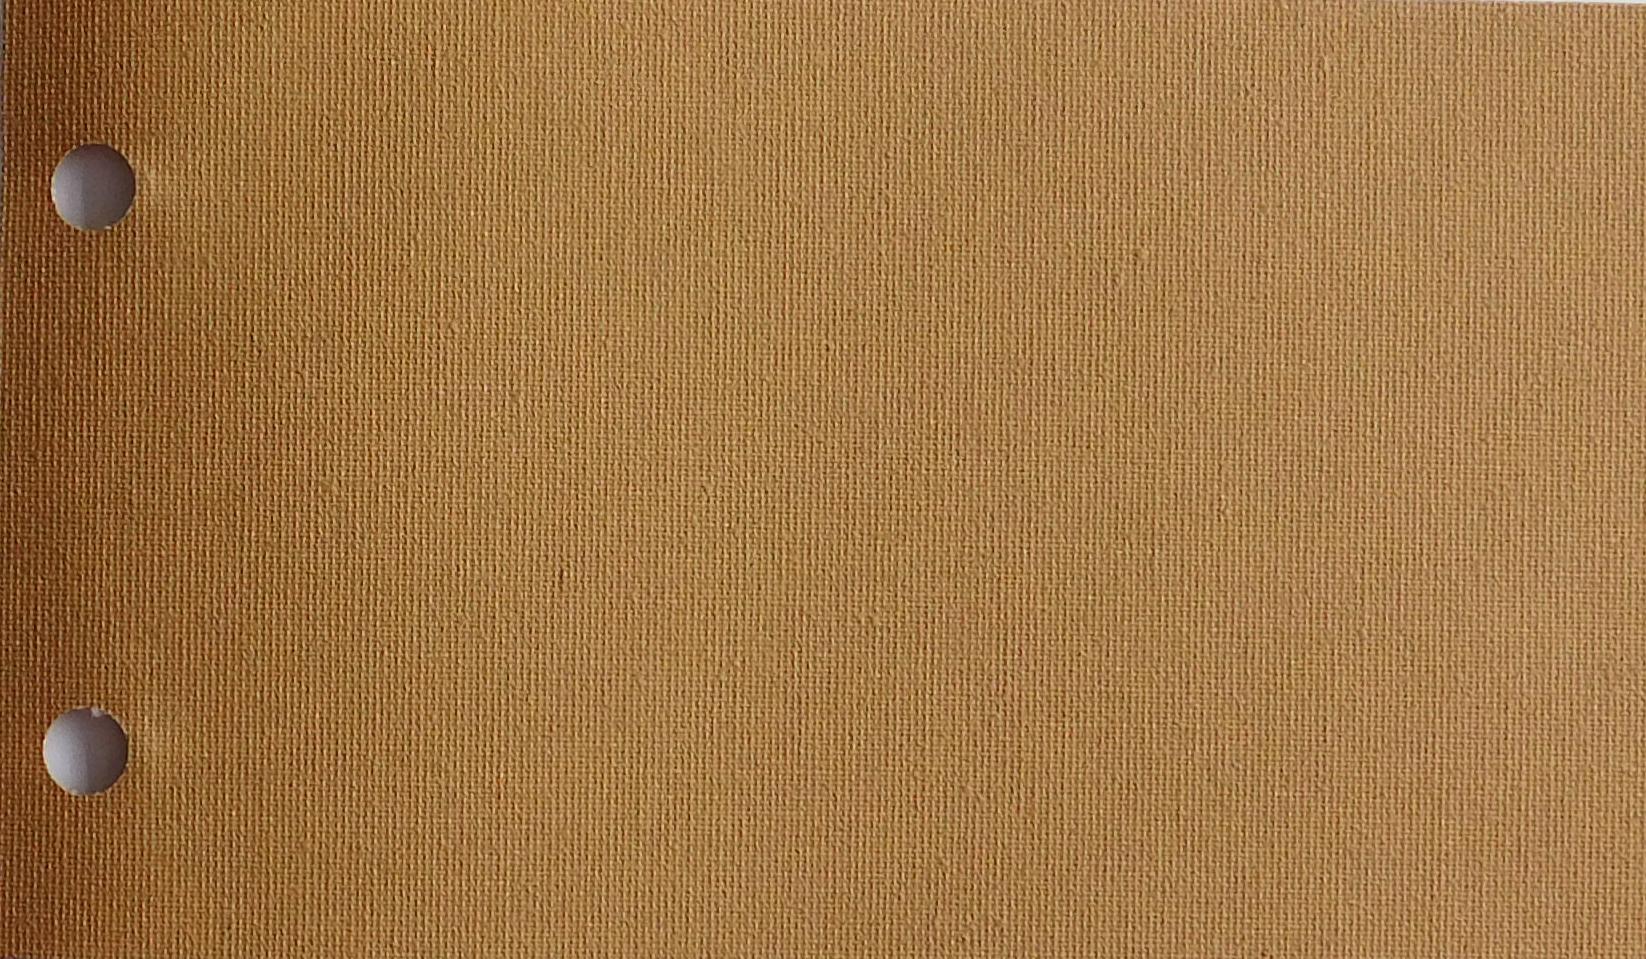 Polaris Ochre blinds fabric